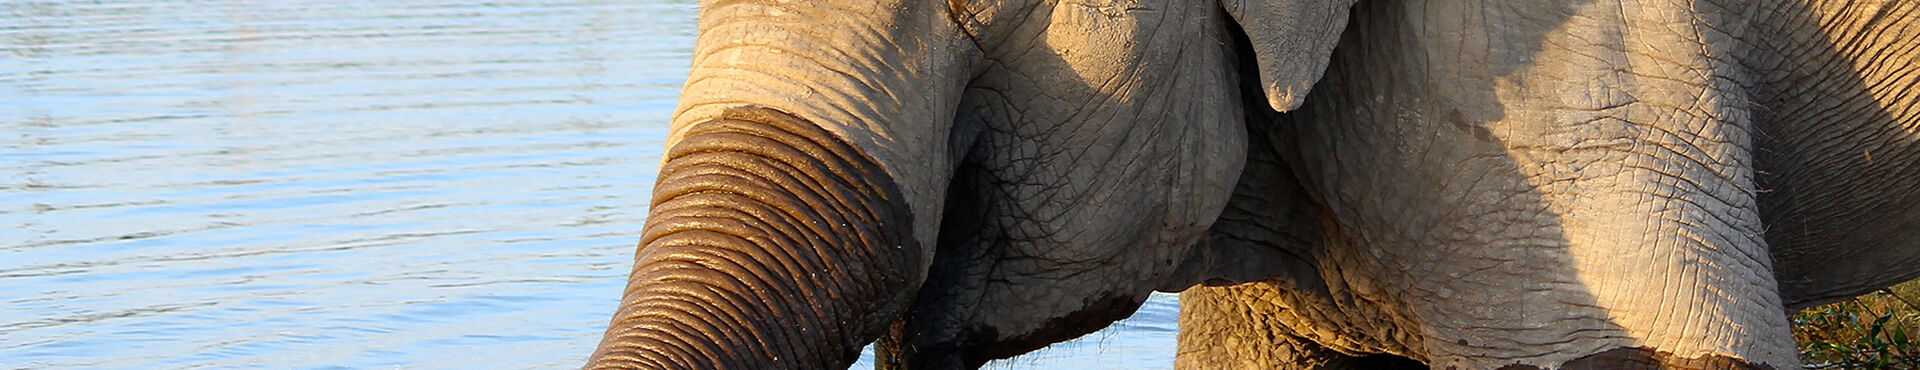 Banner - Elephant Sanctuary Brazil